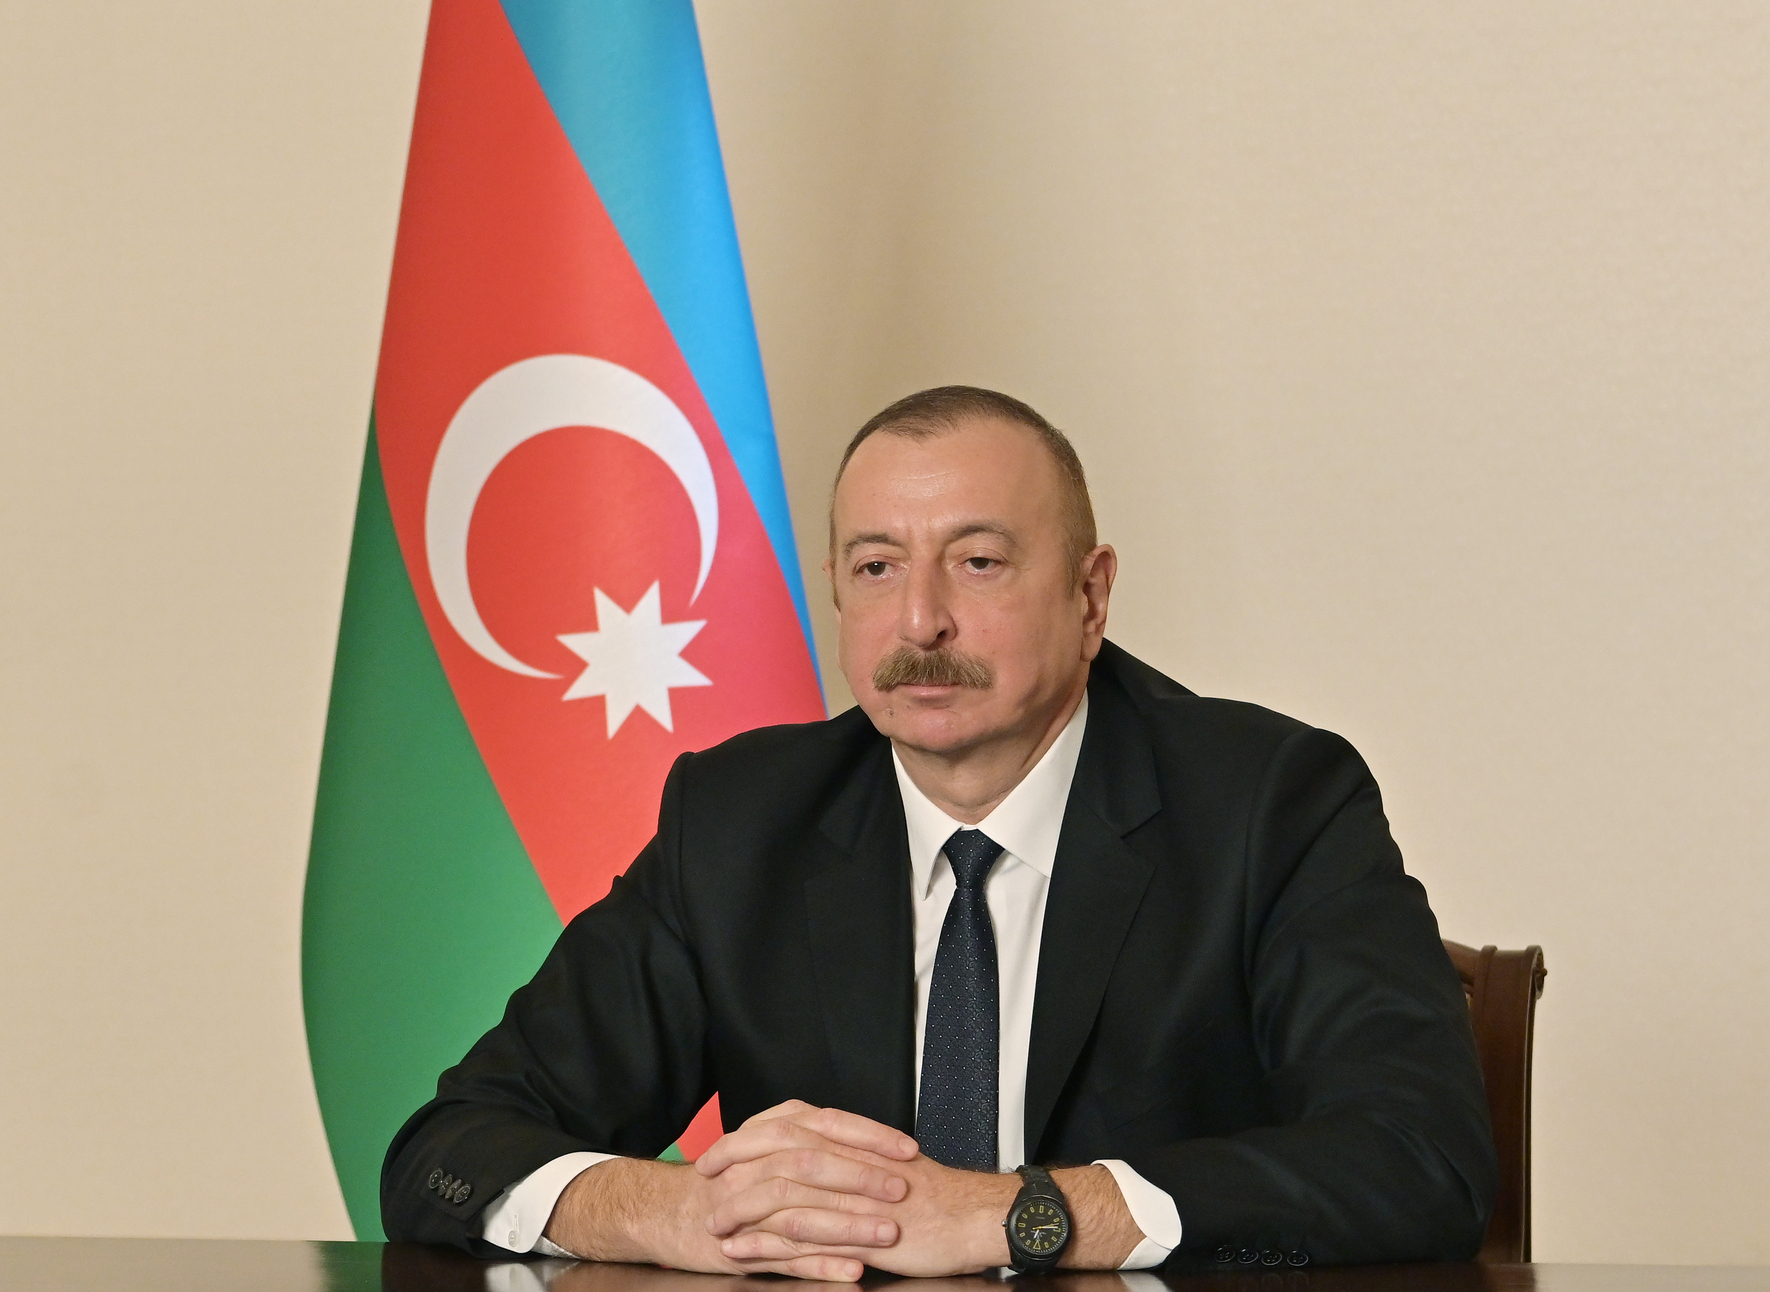 Ilham Aliyev #новости грузия-азербайджан, Ильхам Алиев, карабахская война, Нагорный Карабах